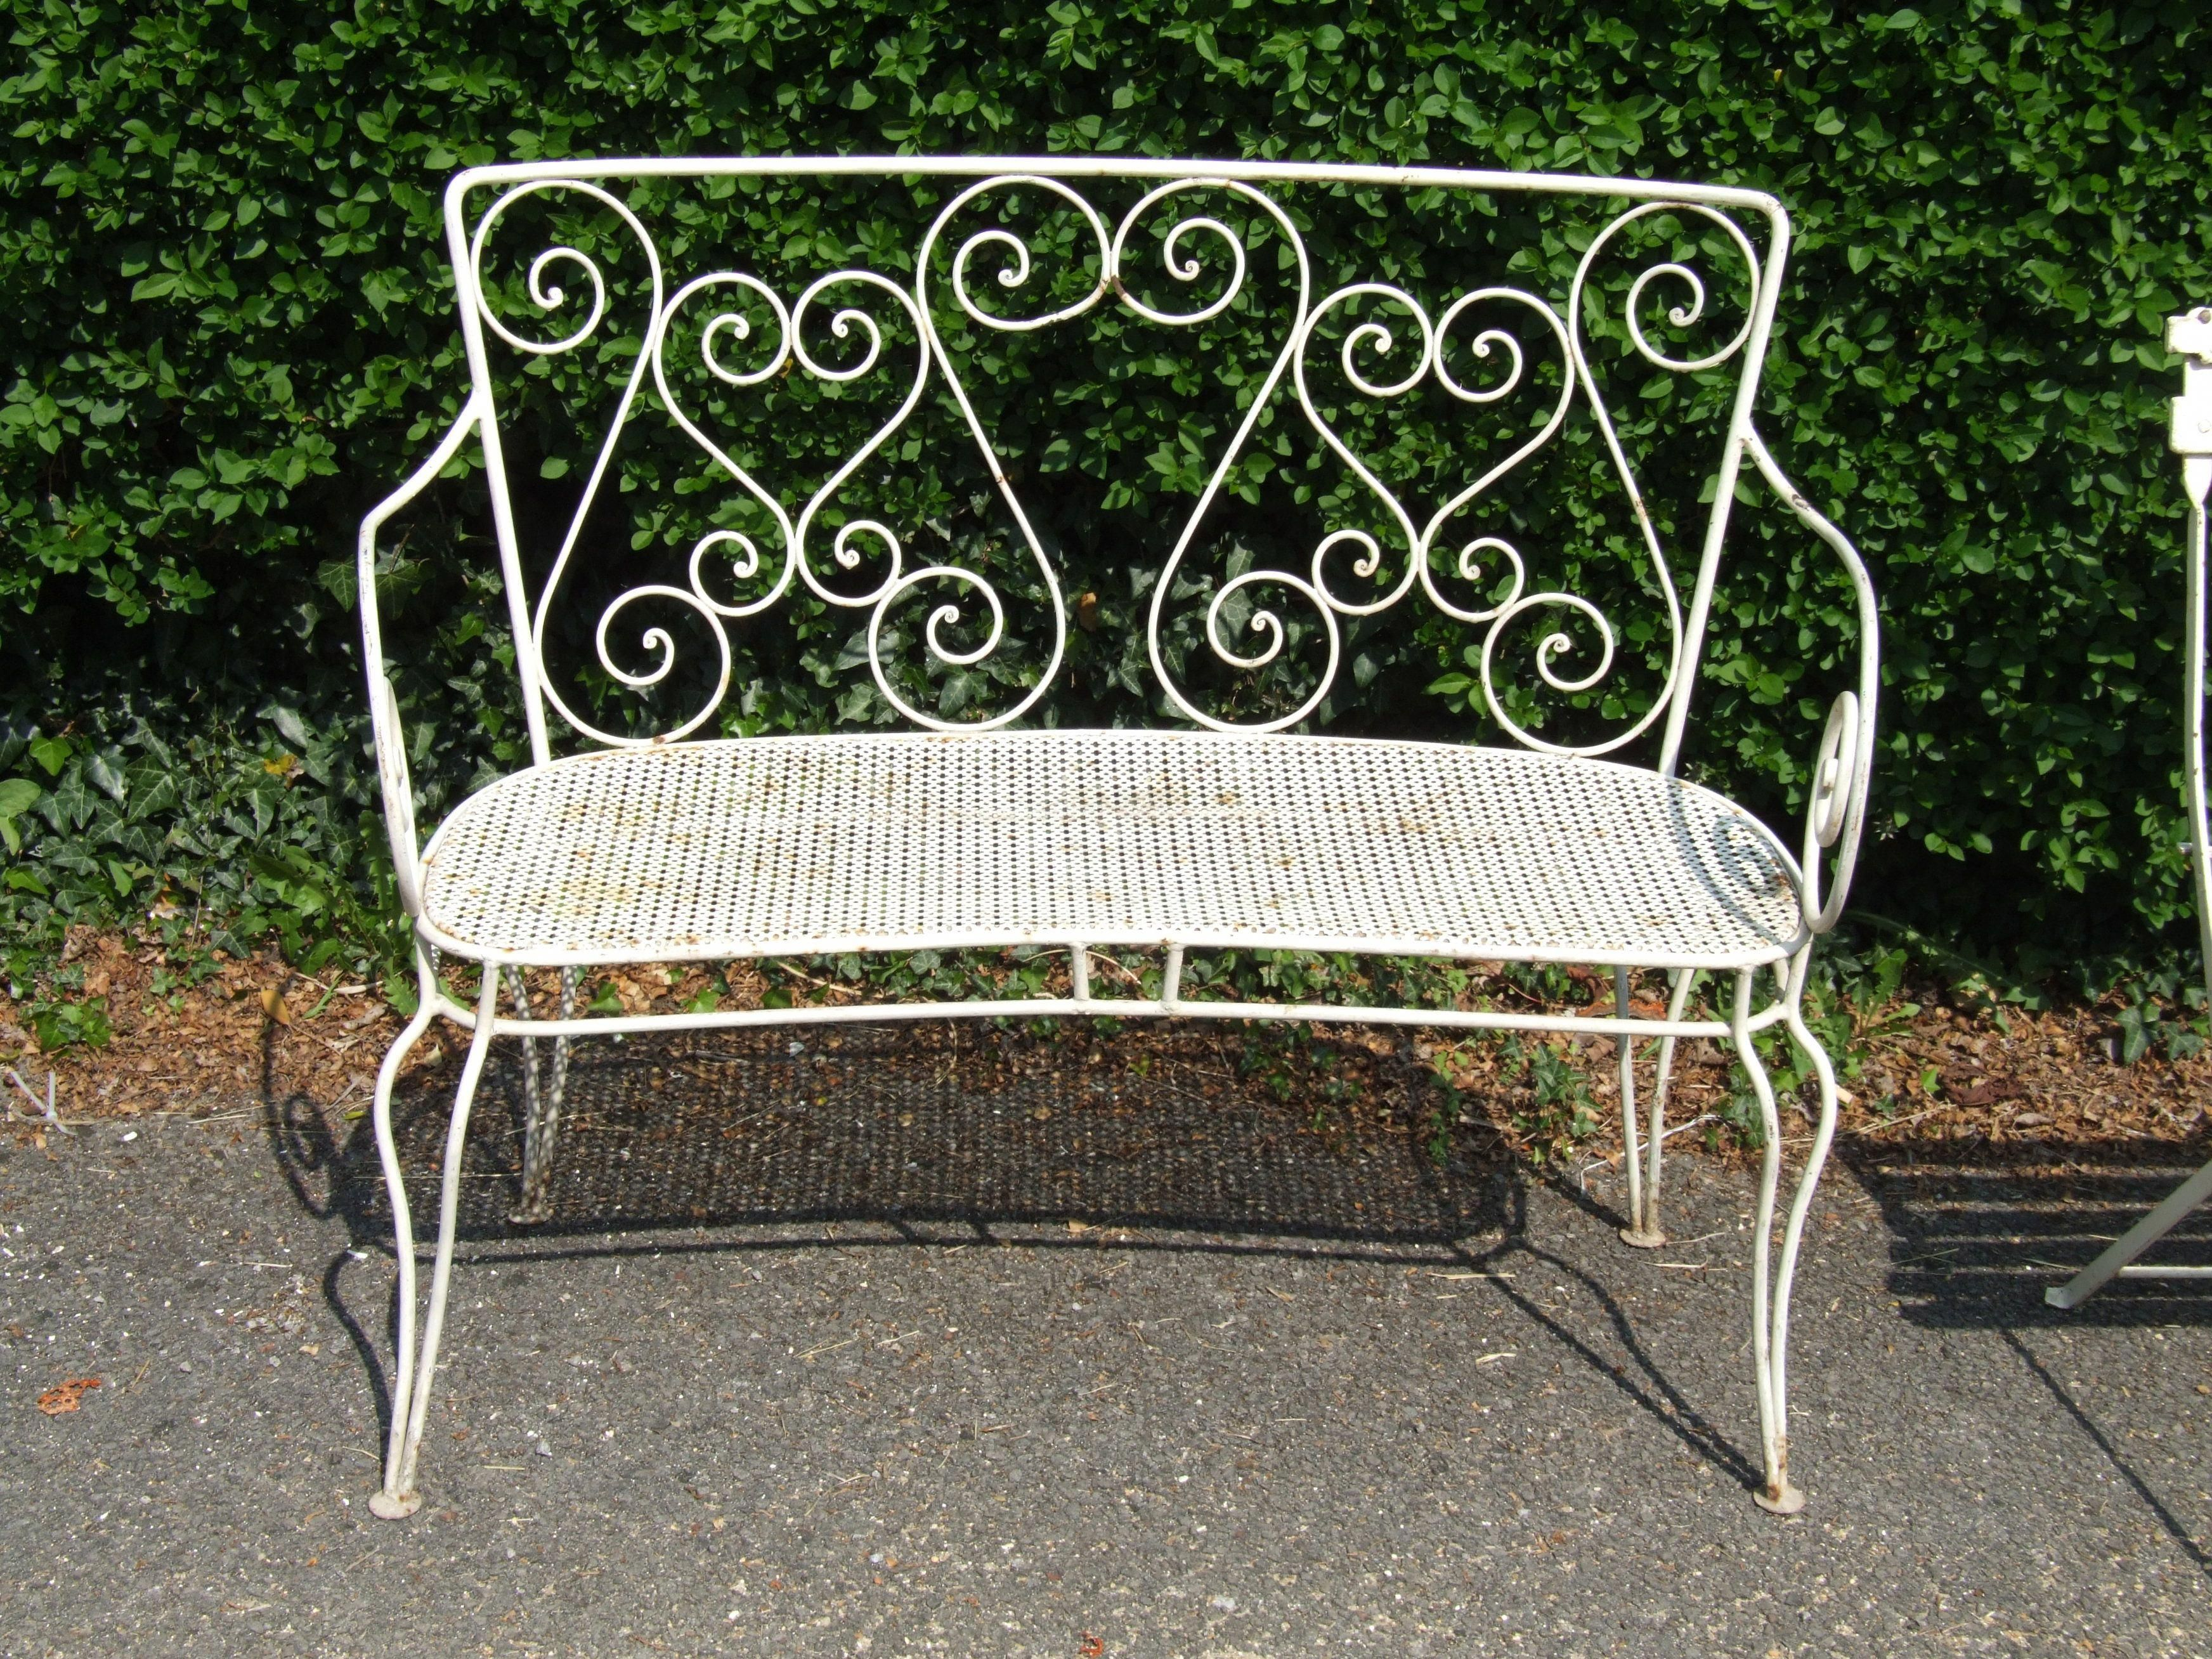 g088 gorgeous vintage french wrought iron garden bench rh pinterest com